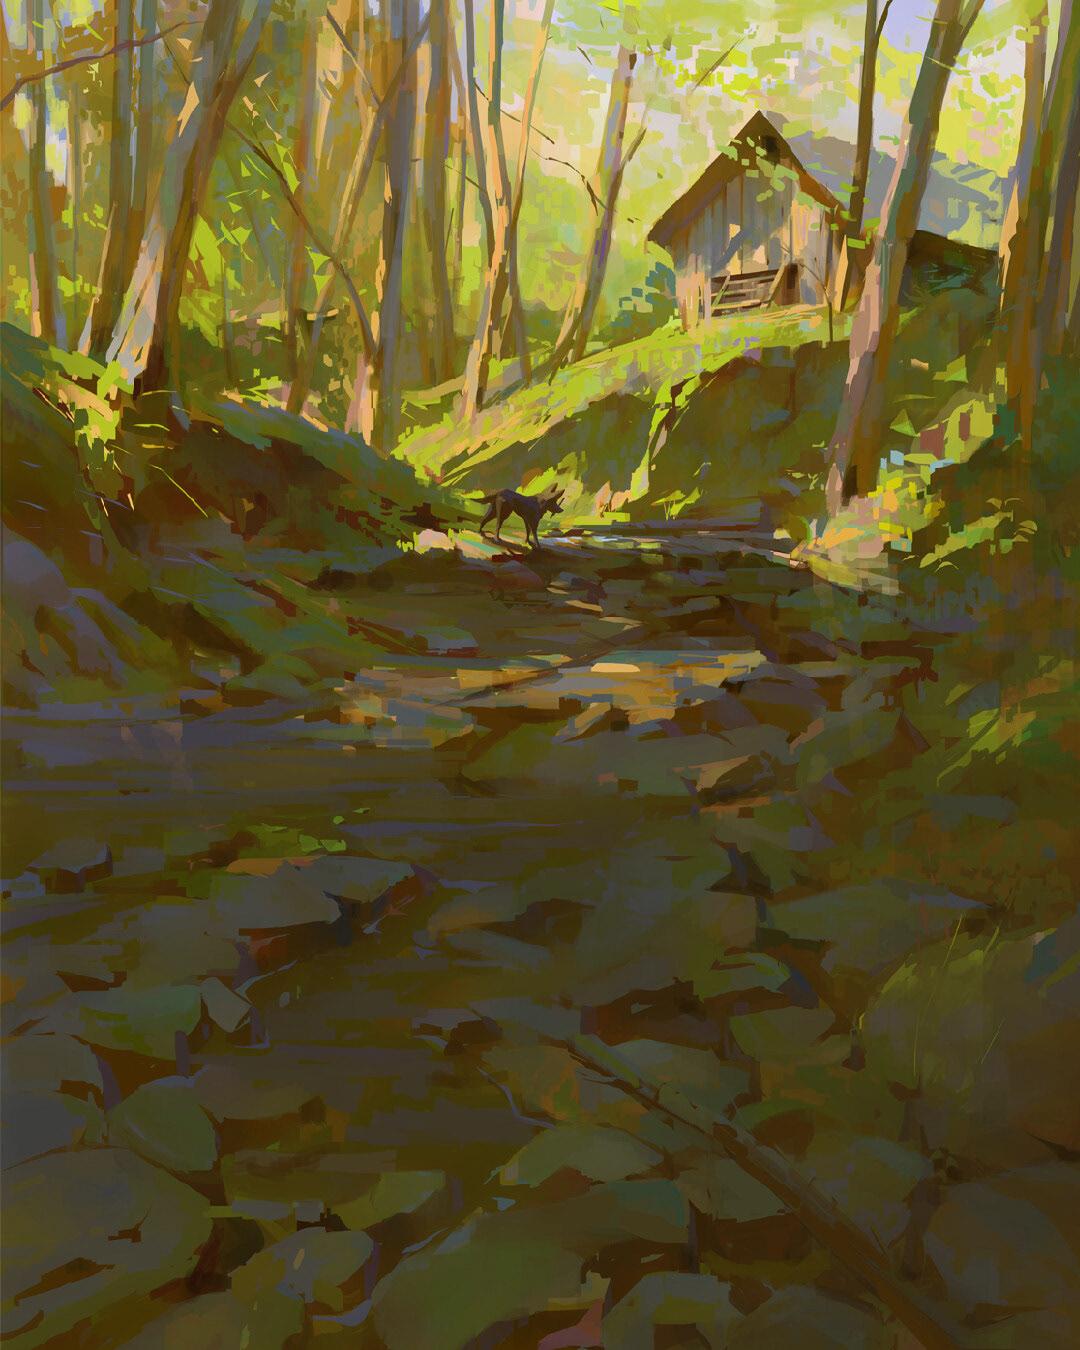 color and light Color Design Environment design environments landscapes Nature Visual Development